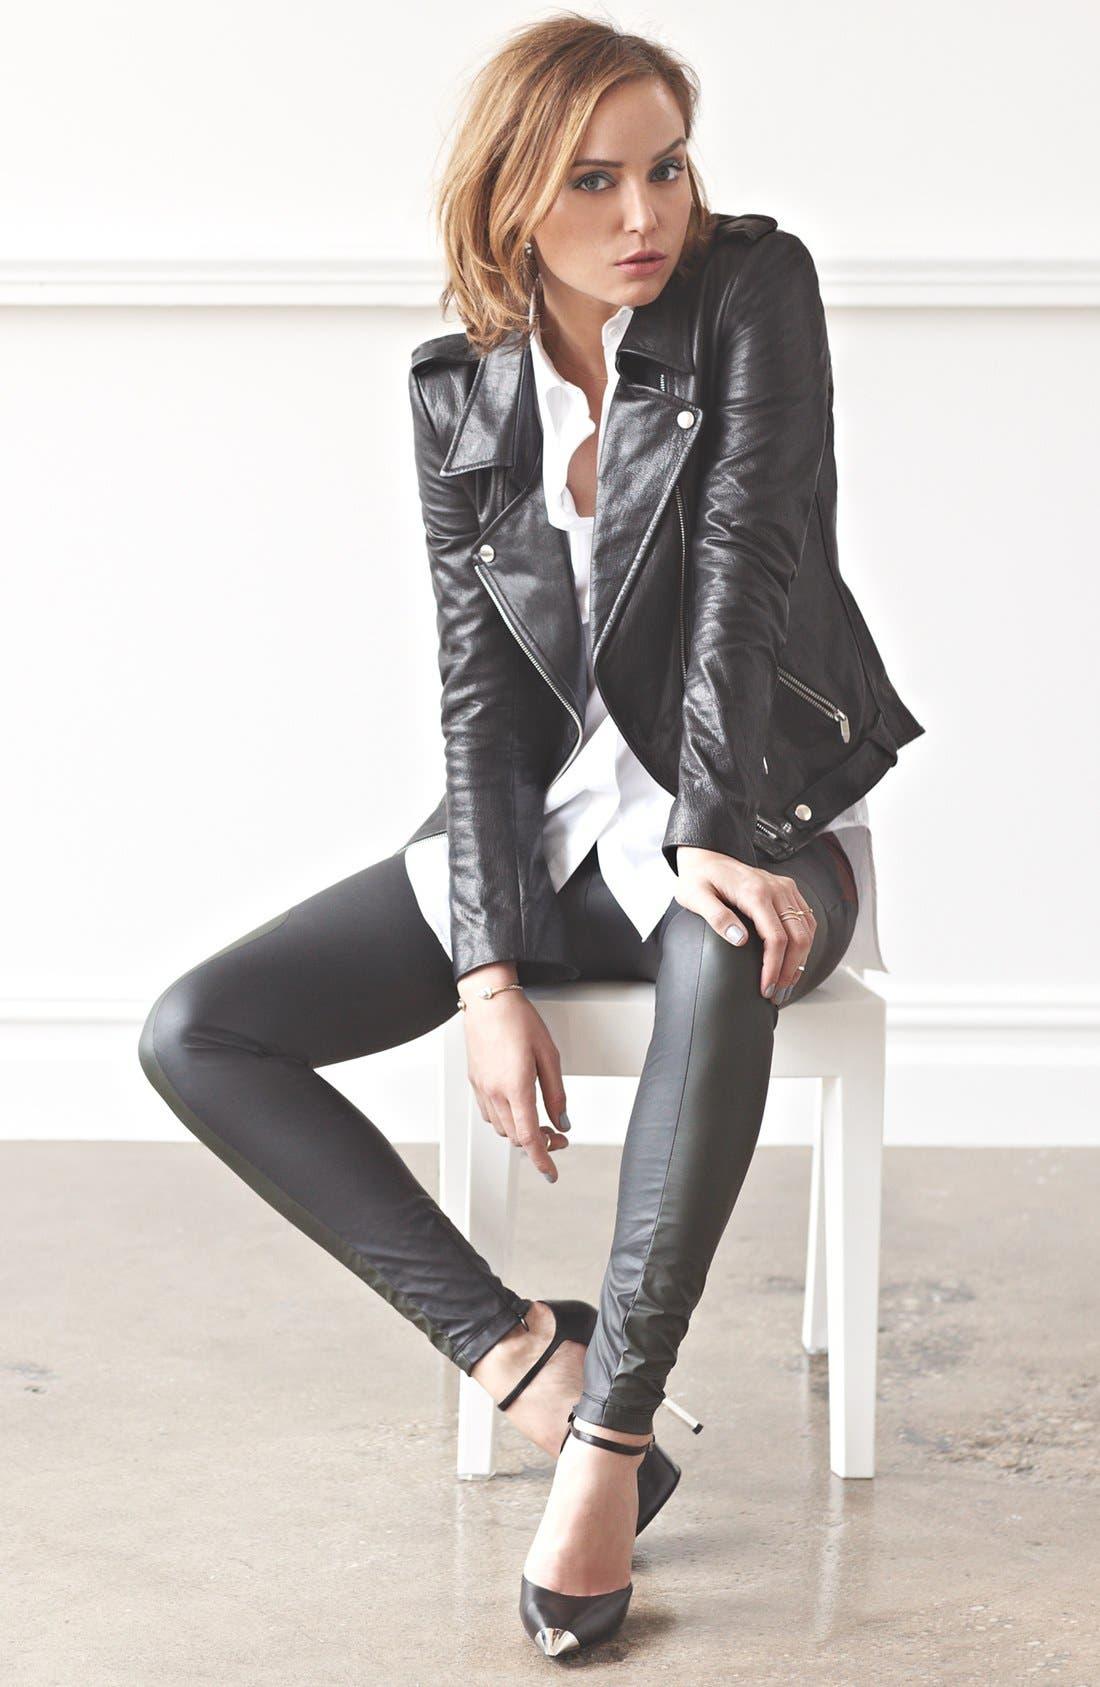 Alternate Image 1 Selected - Theyskens' Theory Jacket & MSGM Leather Leggings